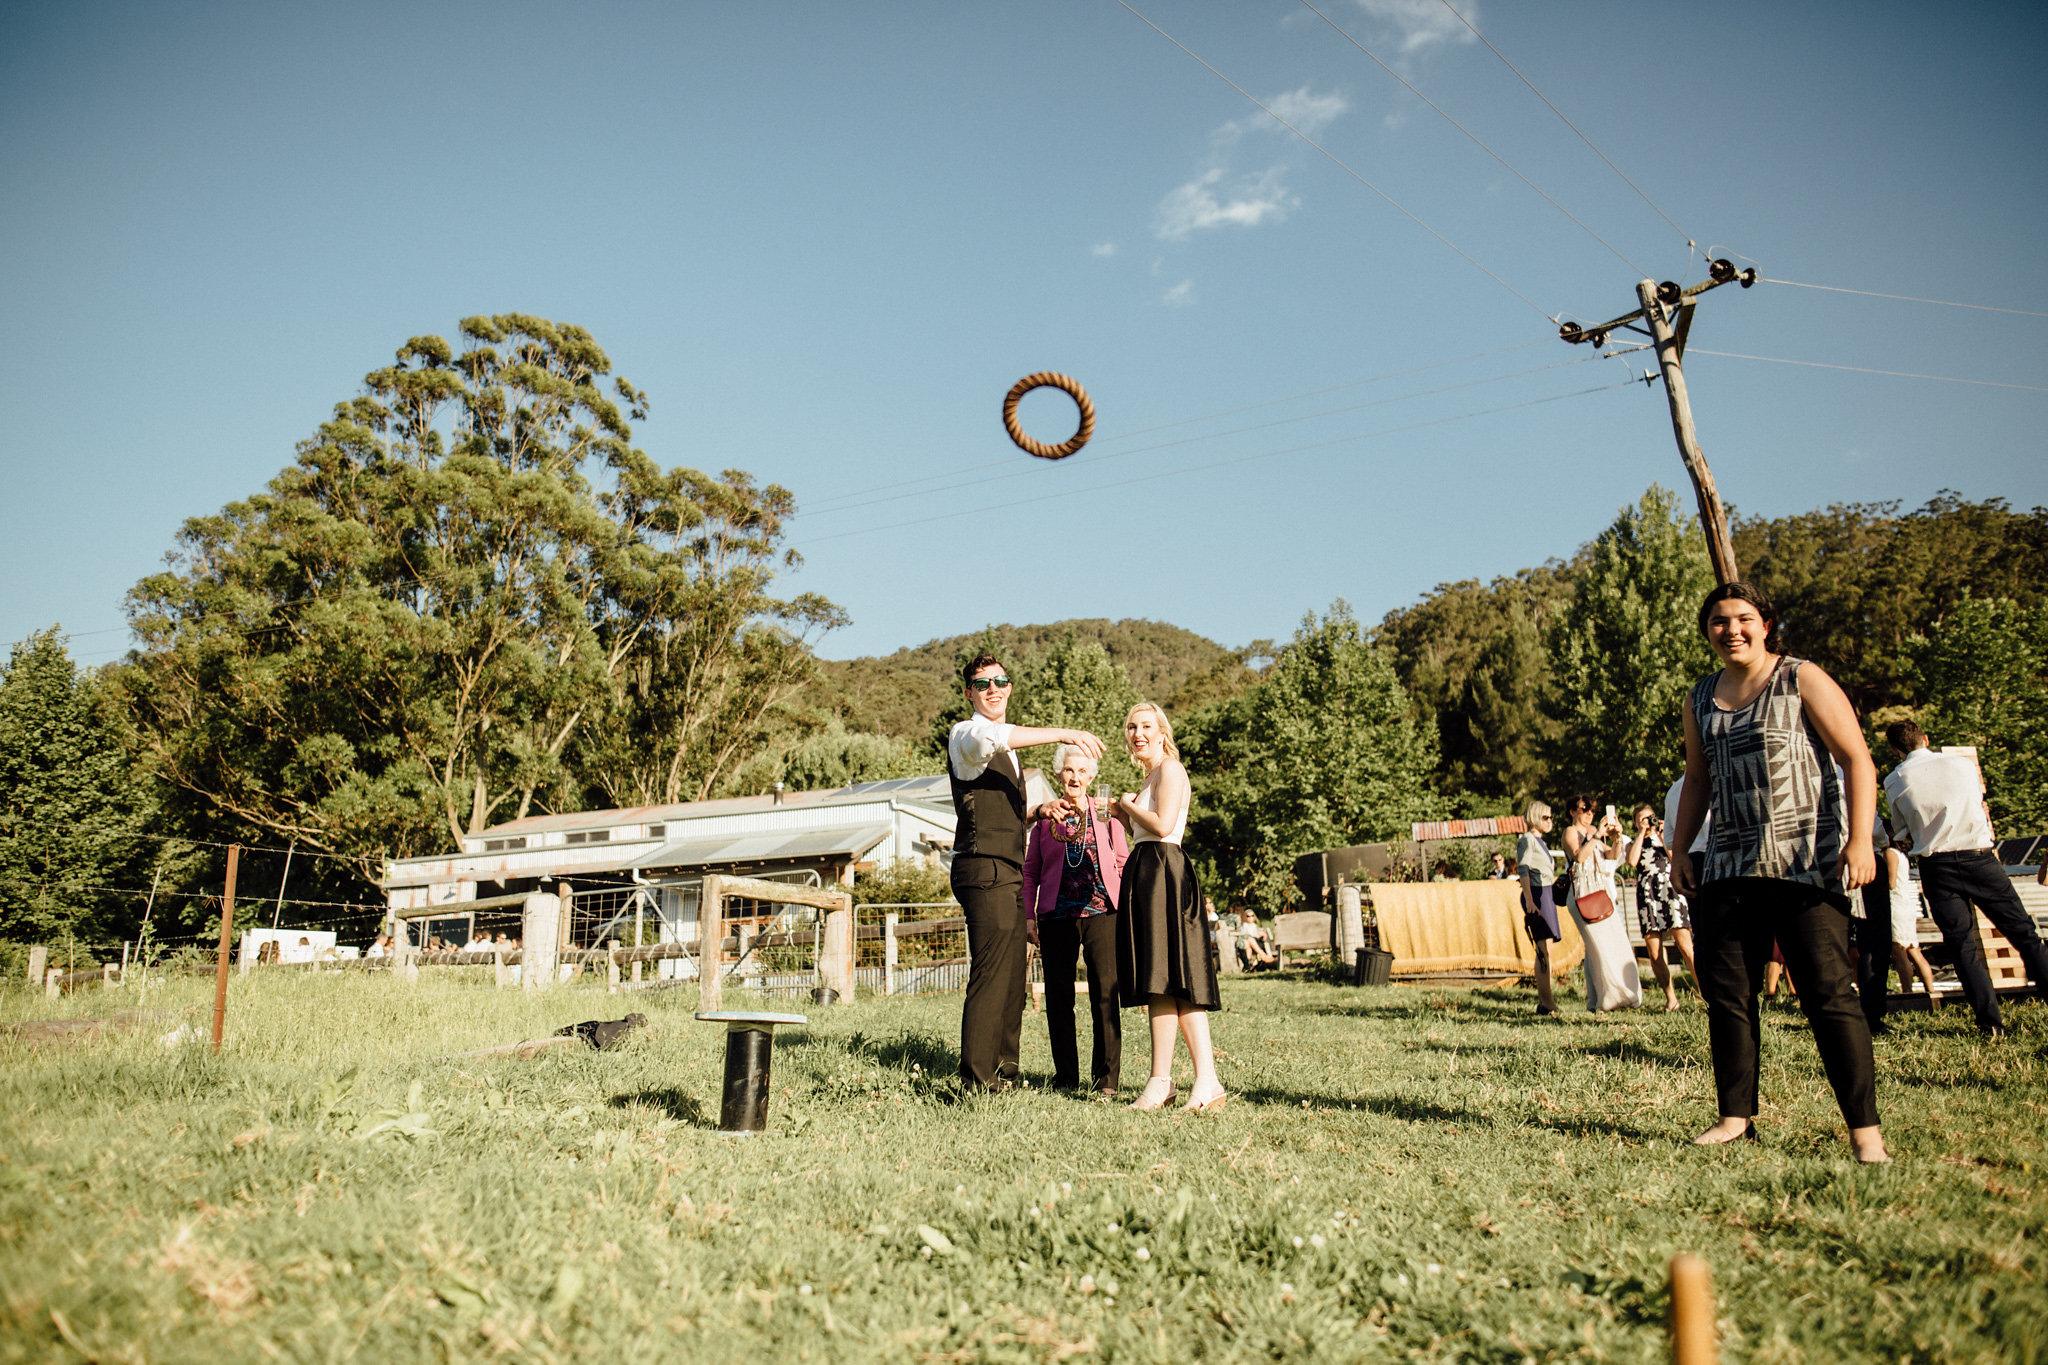 lawn games at a wedding